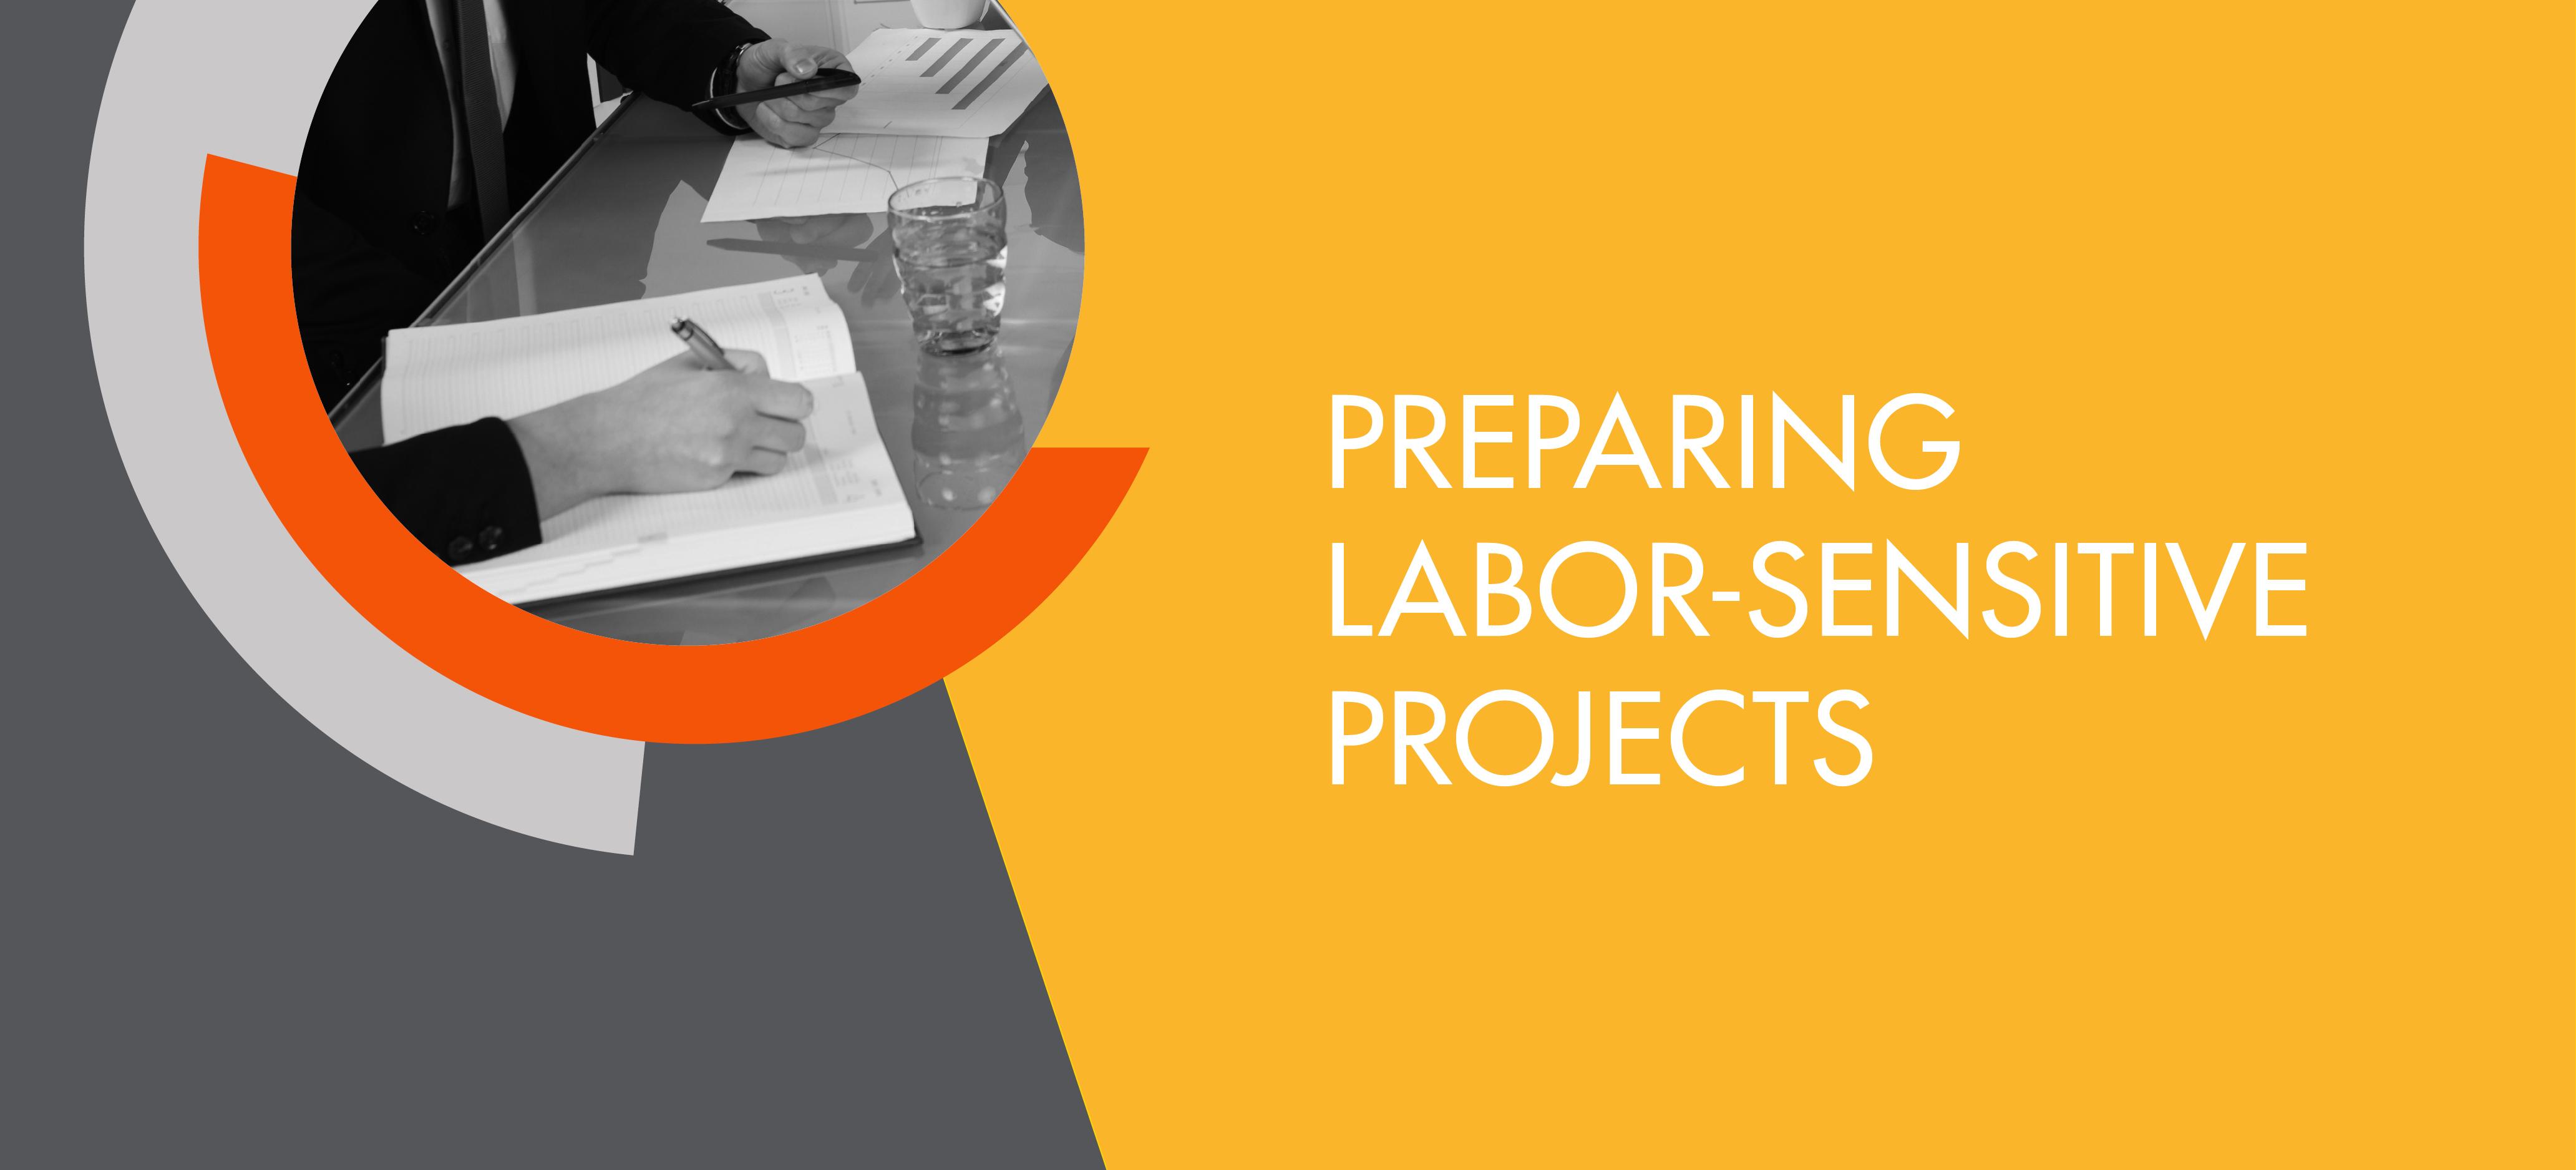 Preparing labor-sensitive projects